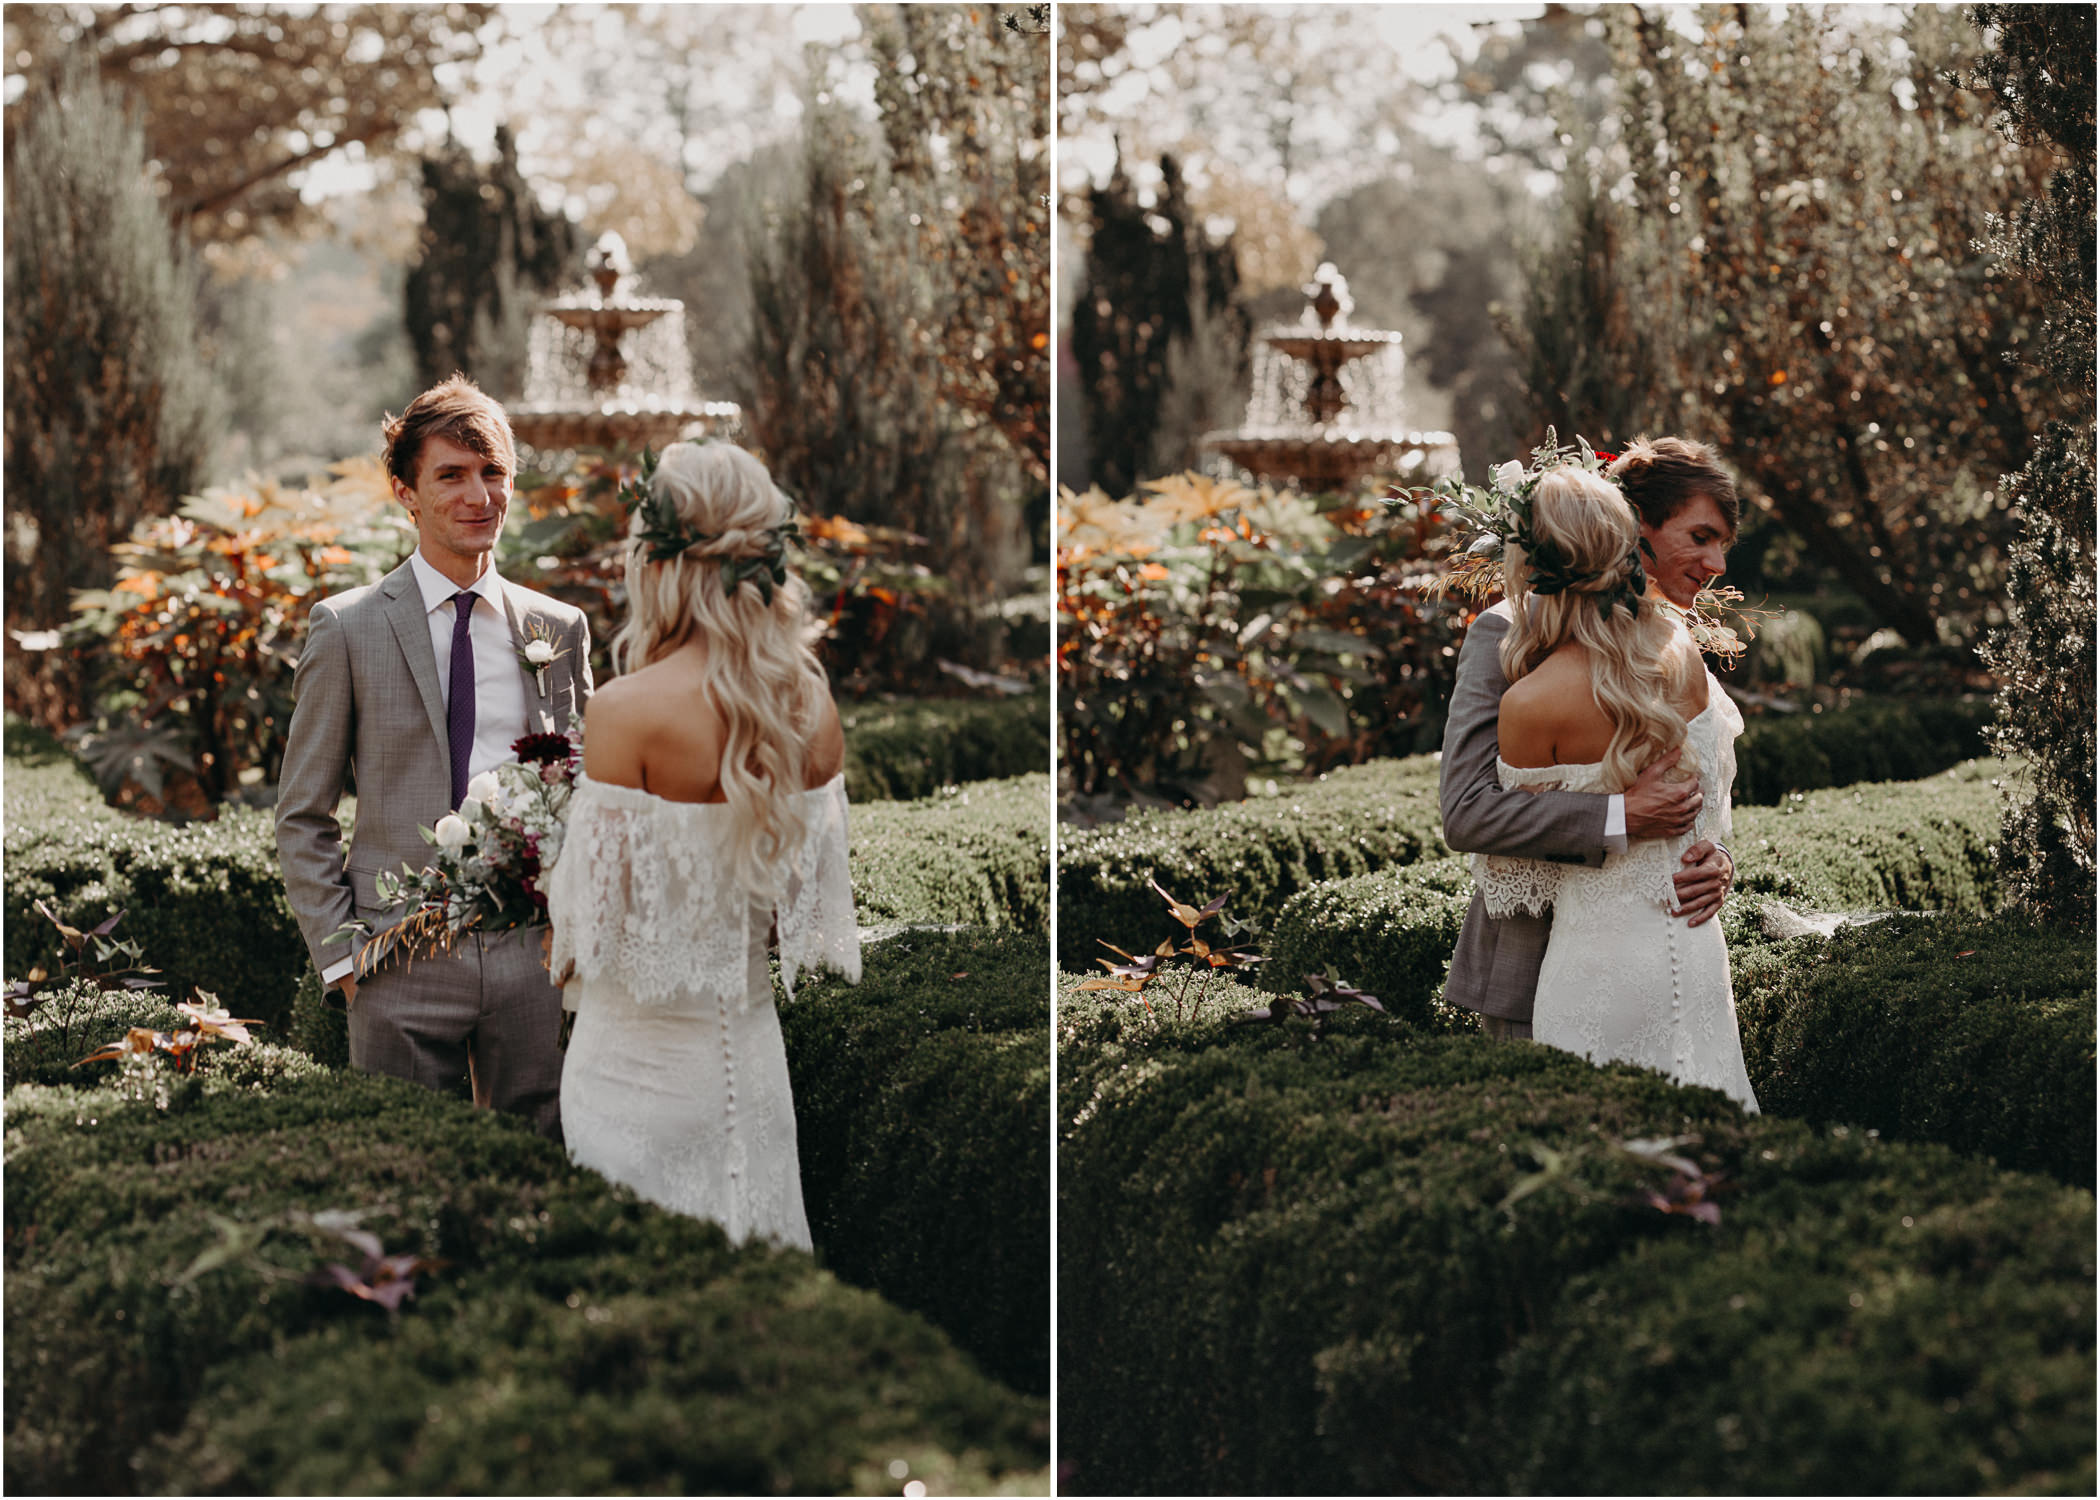 25 - Barnsley Gardens Wedding - Bride portraits - First Look .jpg